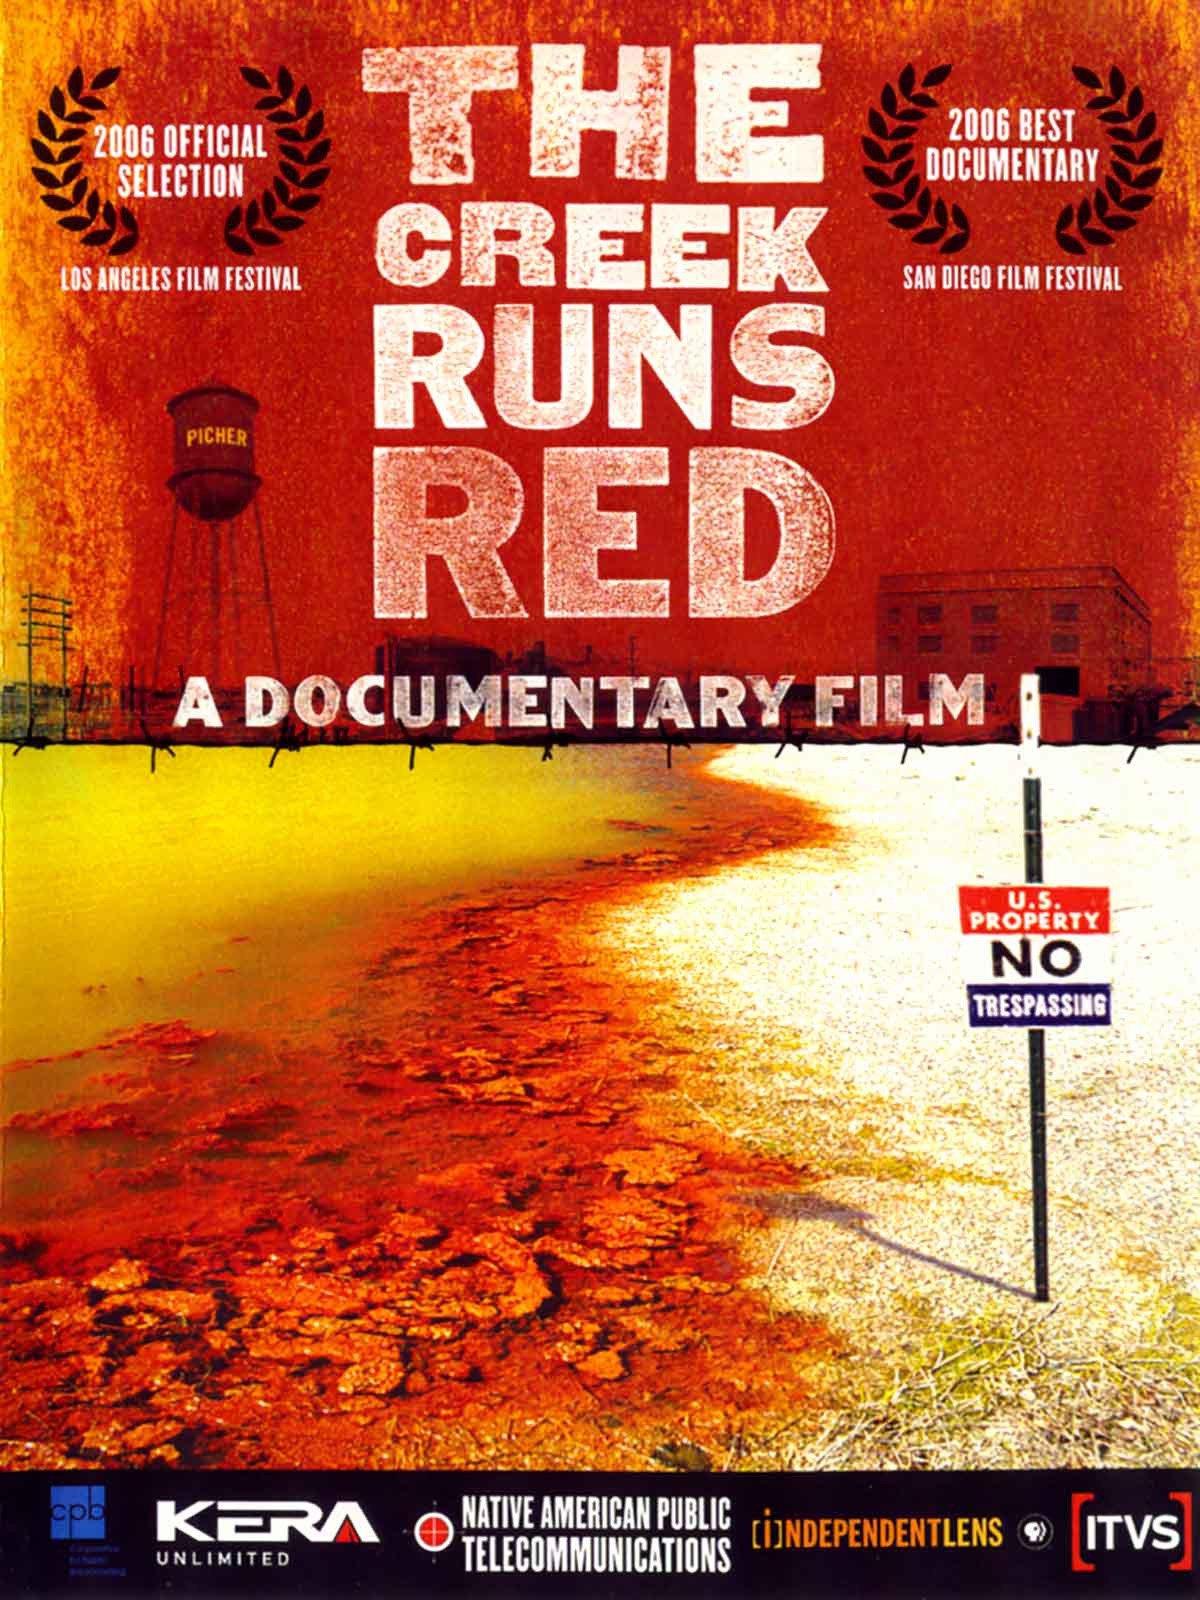 The Creek Runs Red